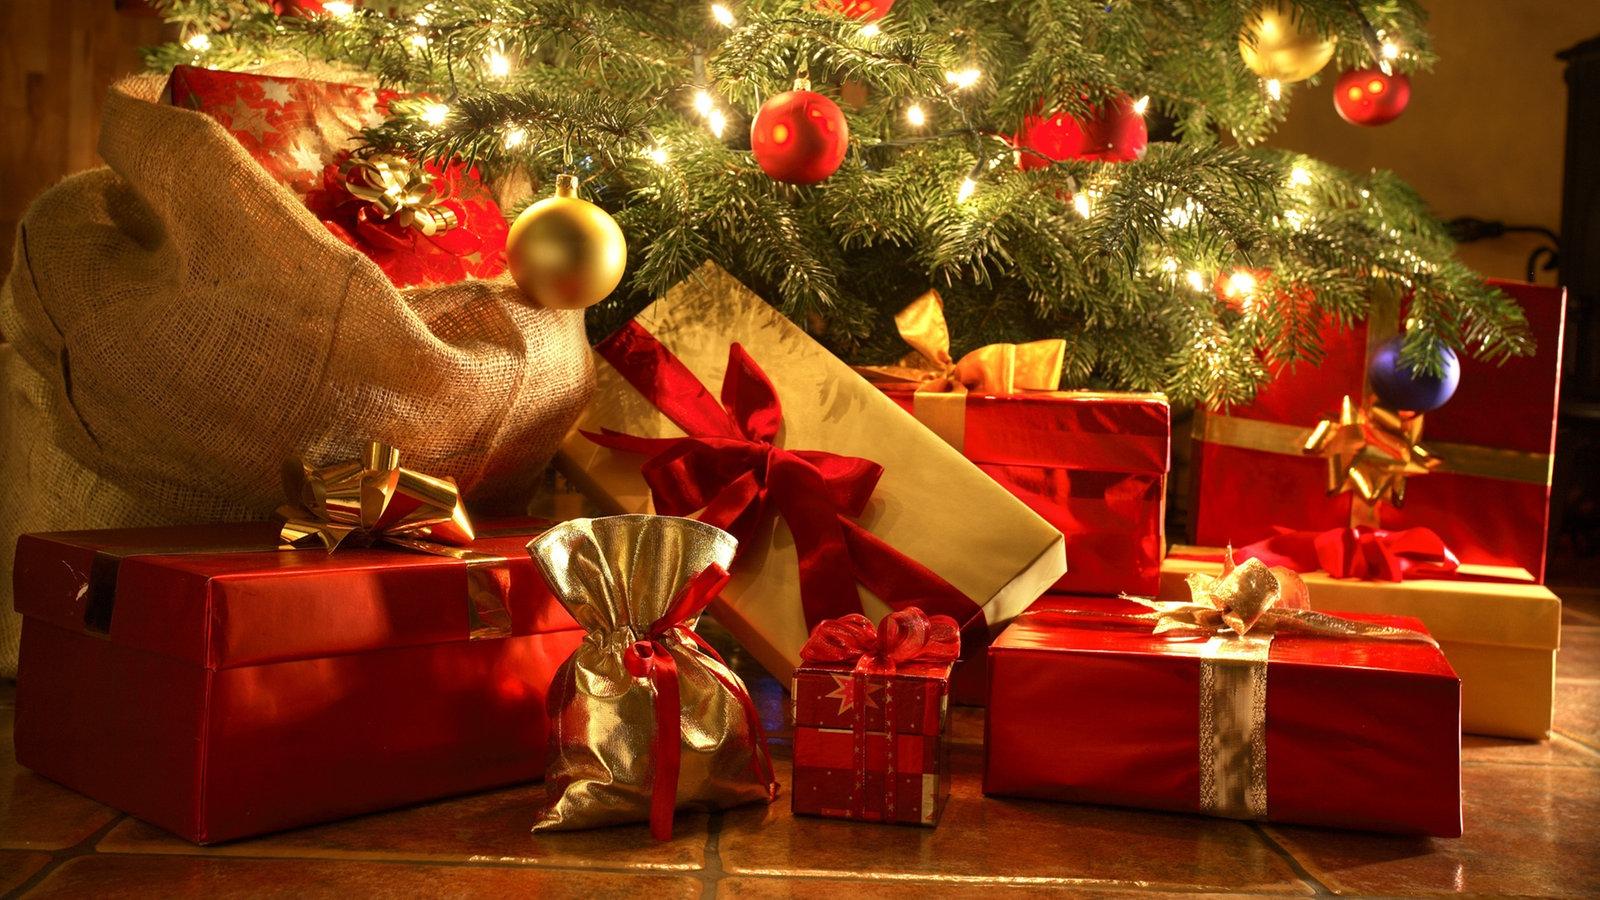 Read more about the article Fröhliche Weihnachten